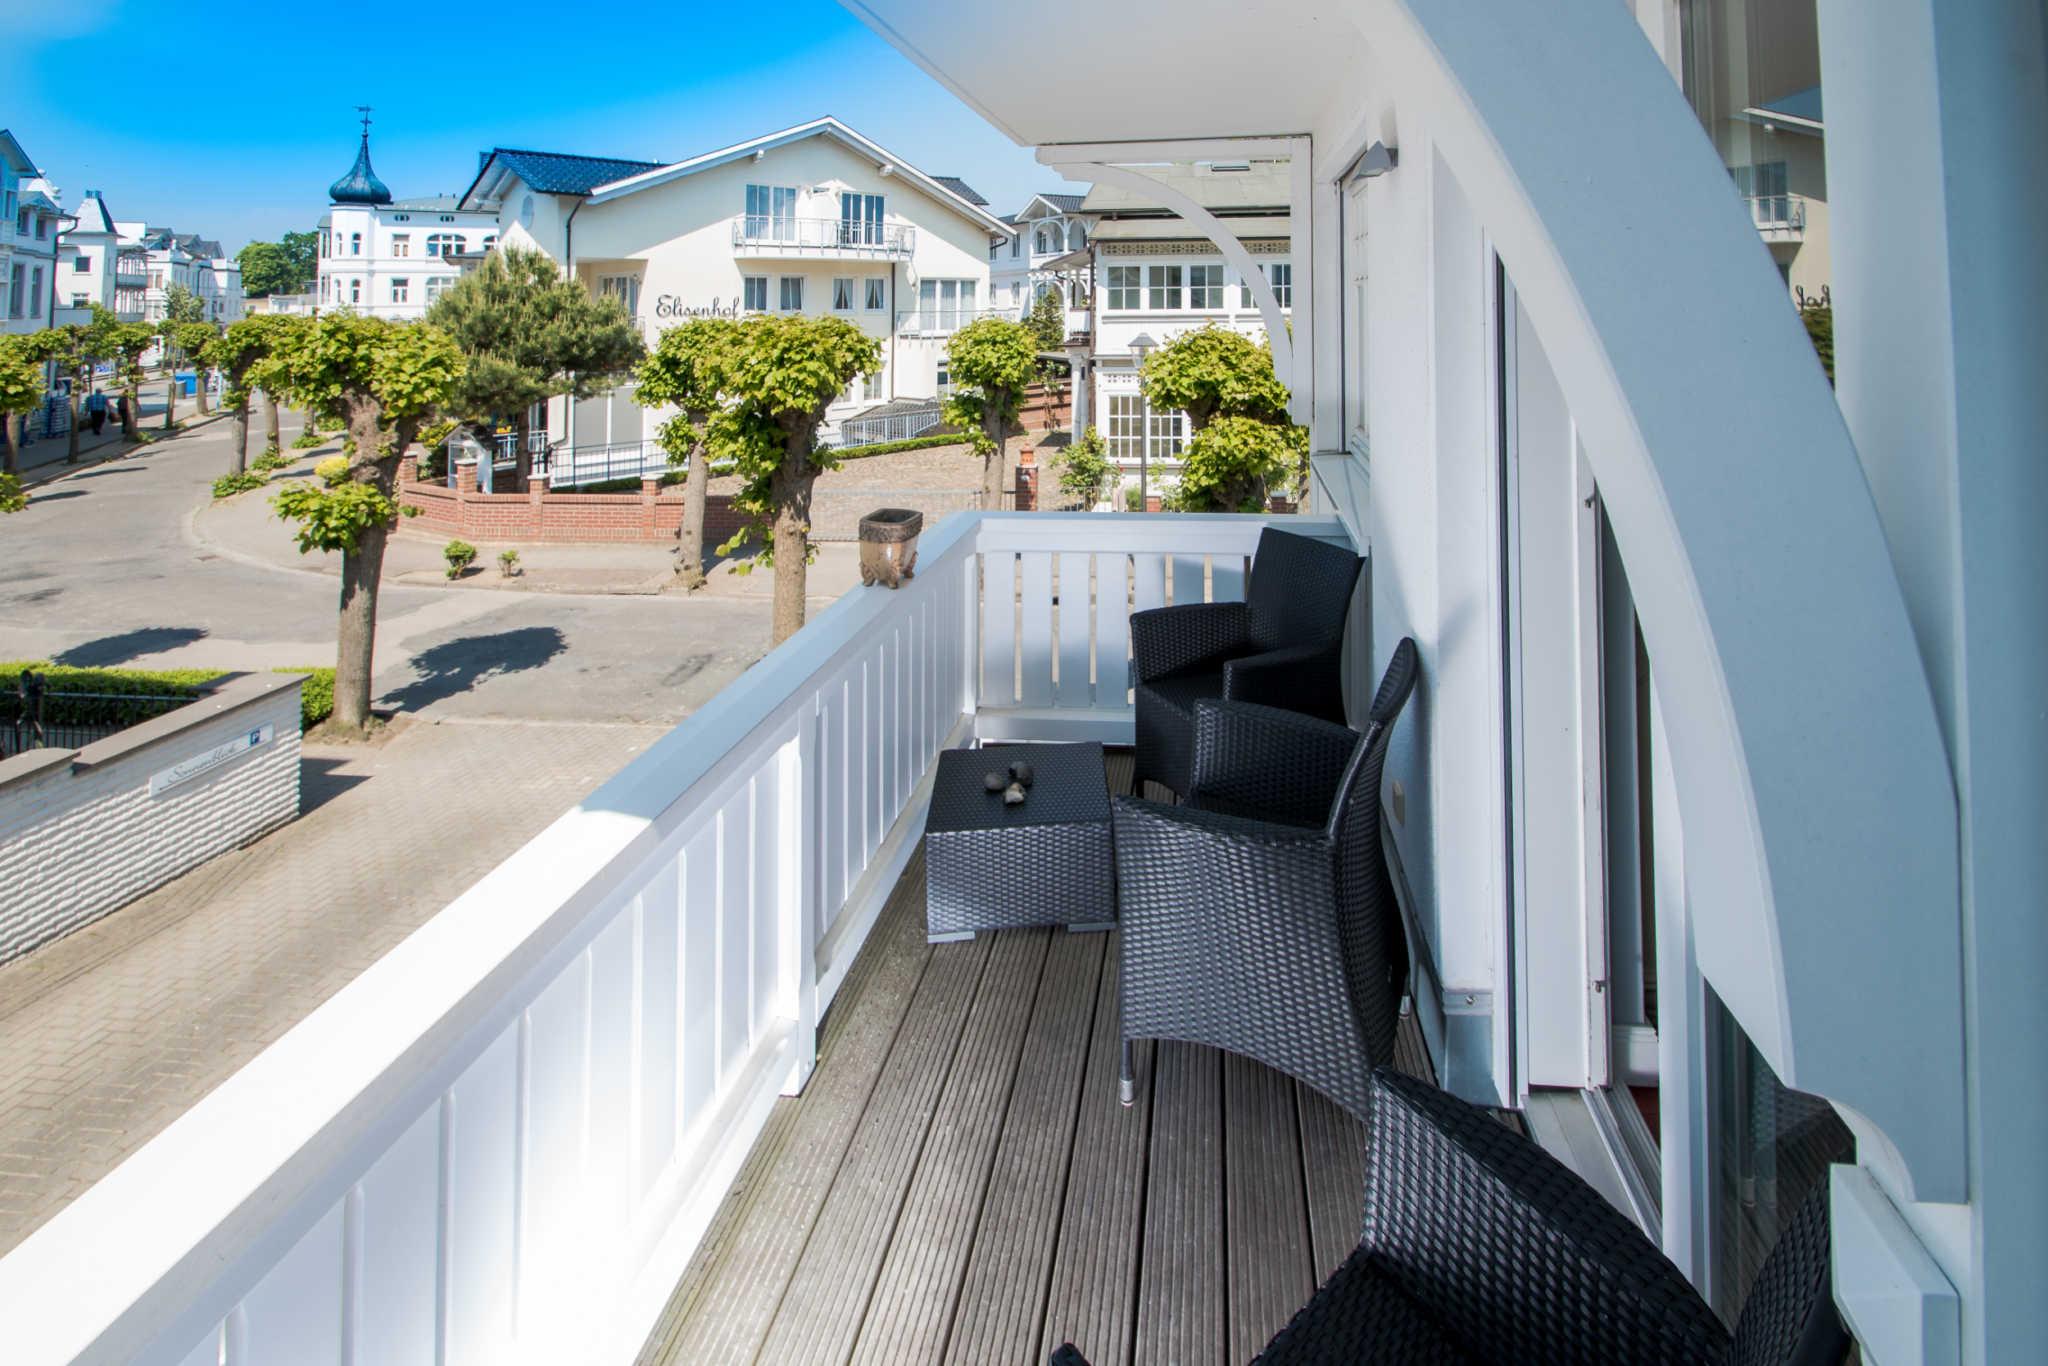 Villa Hansa, App. 4, 2 SZ, 2 Bäder, in Binz, 2 möbl. Balkone